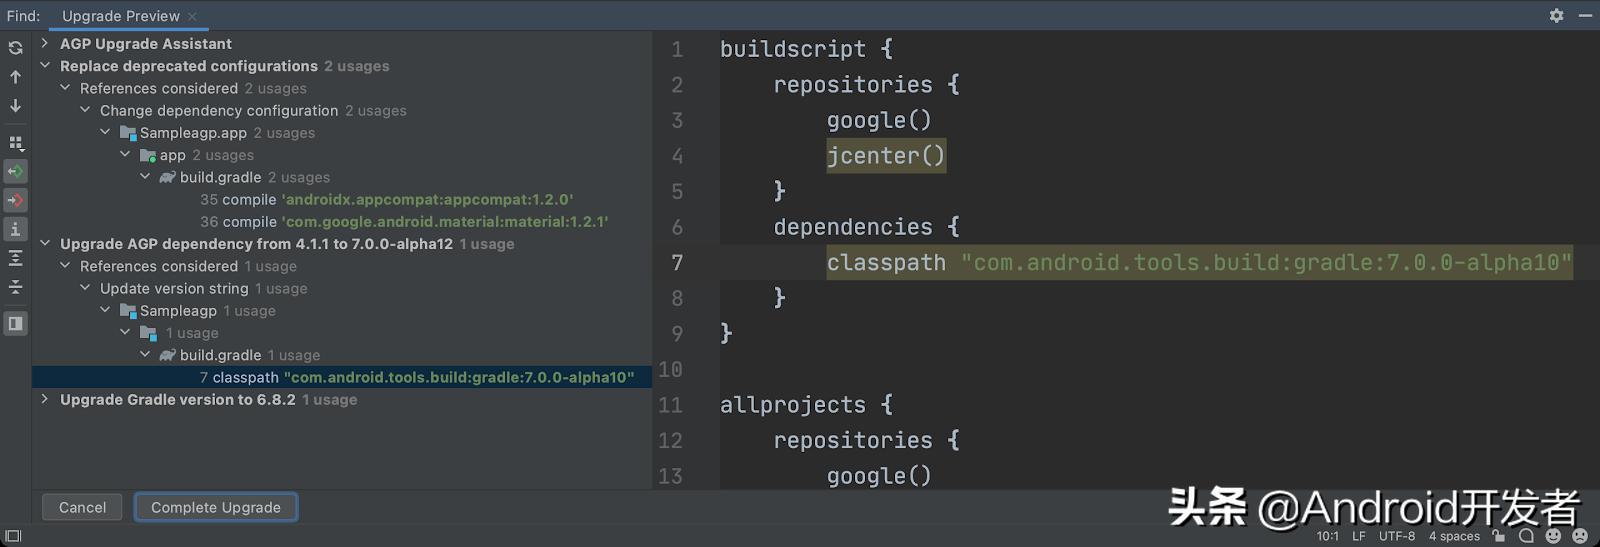 Android Studio 4.2 现已发布